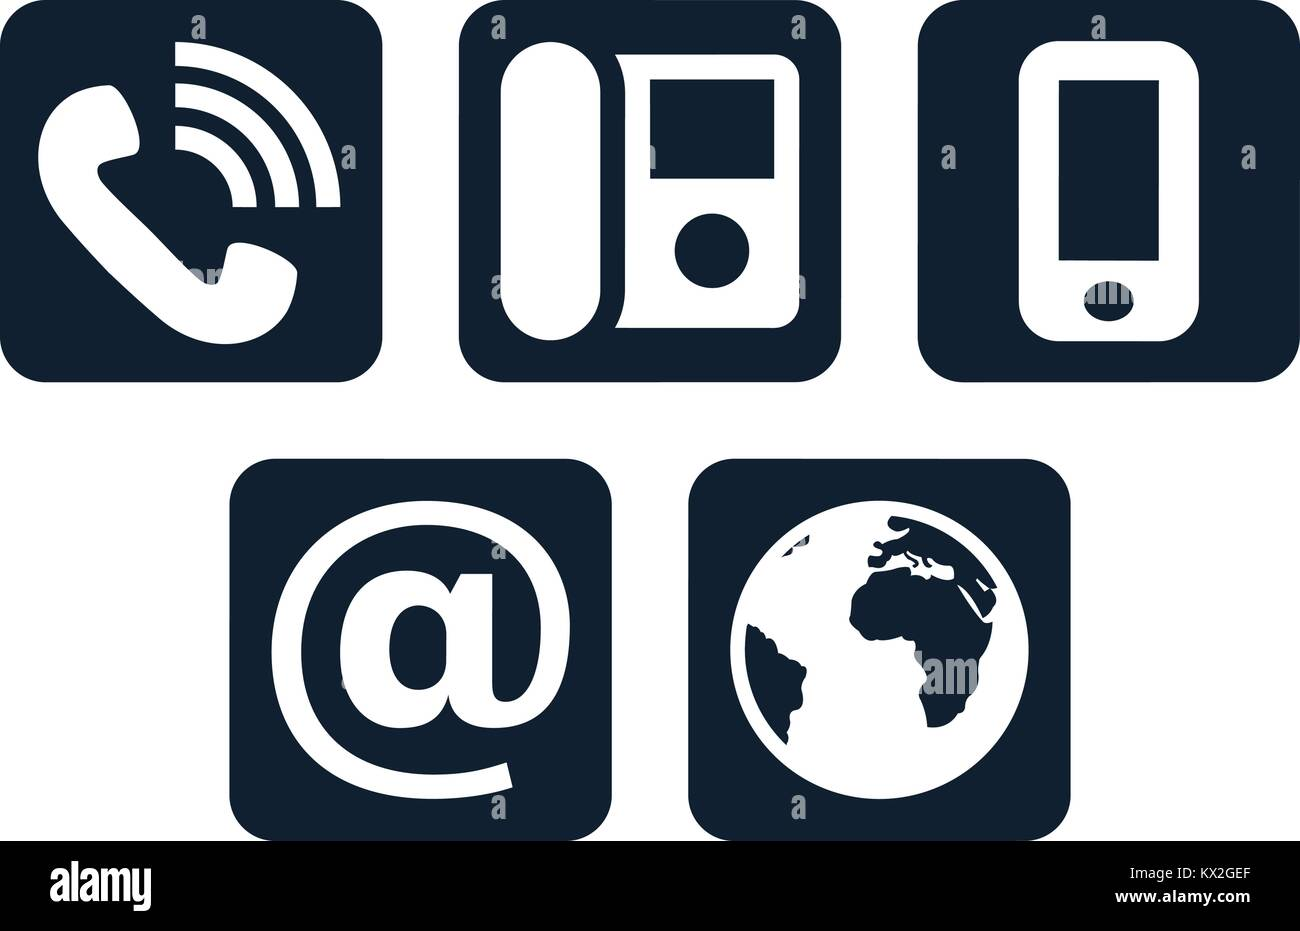 Landline Phone Stock Vector Images - Alamy